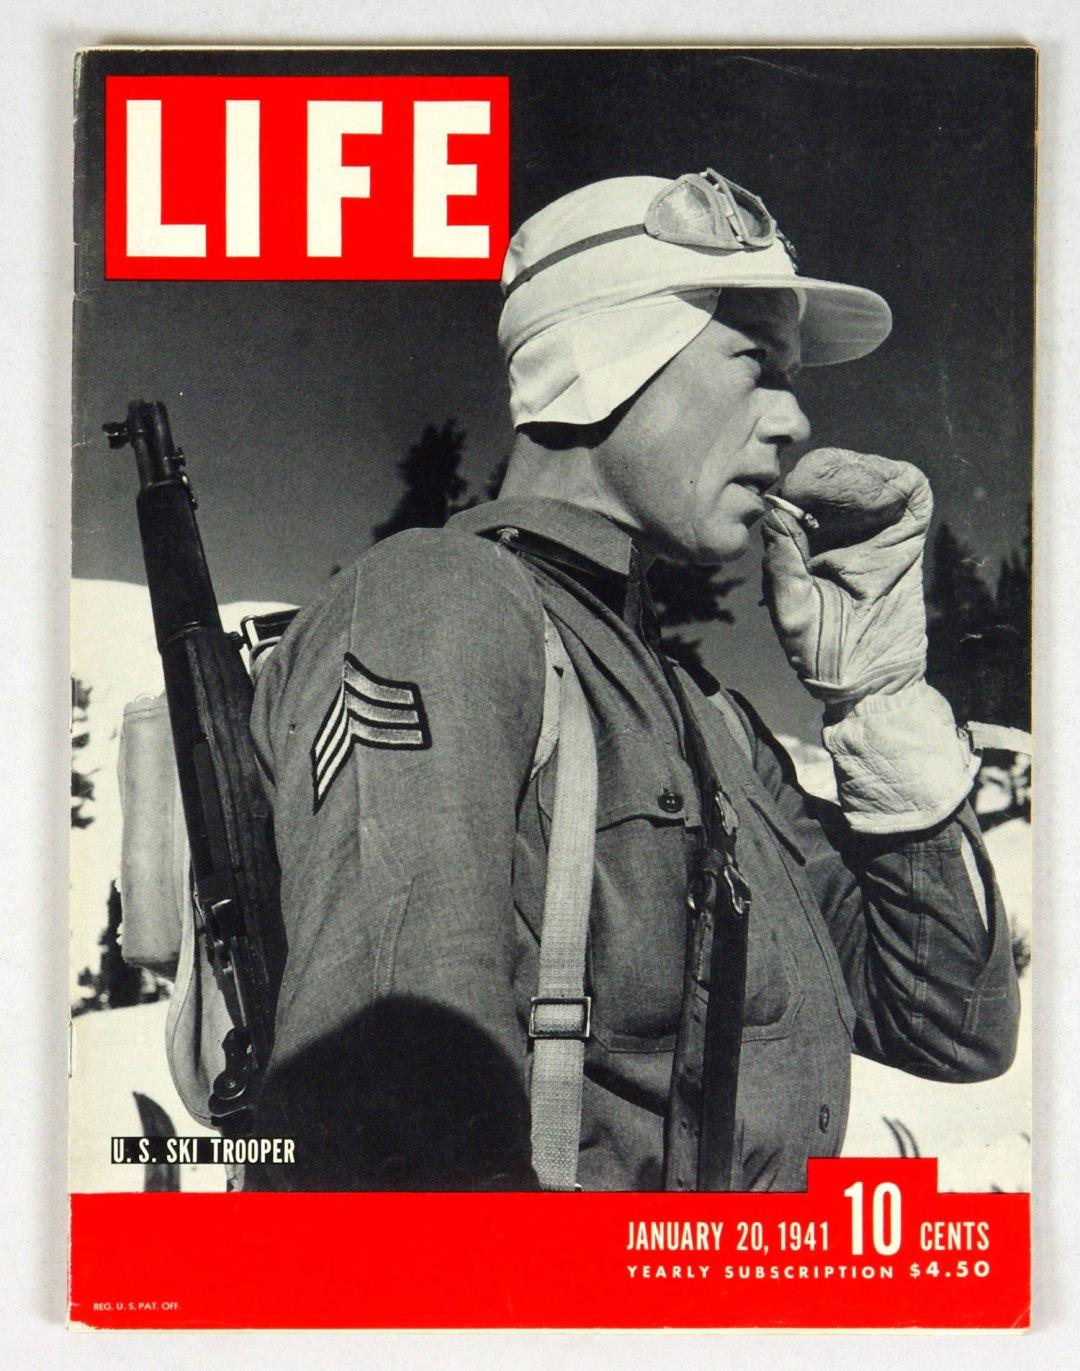 LIFE Magazine 1941 January 20 US Ski Trooper